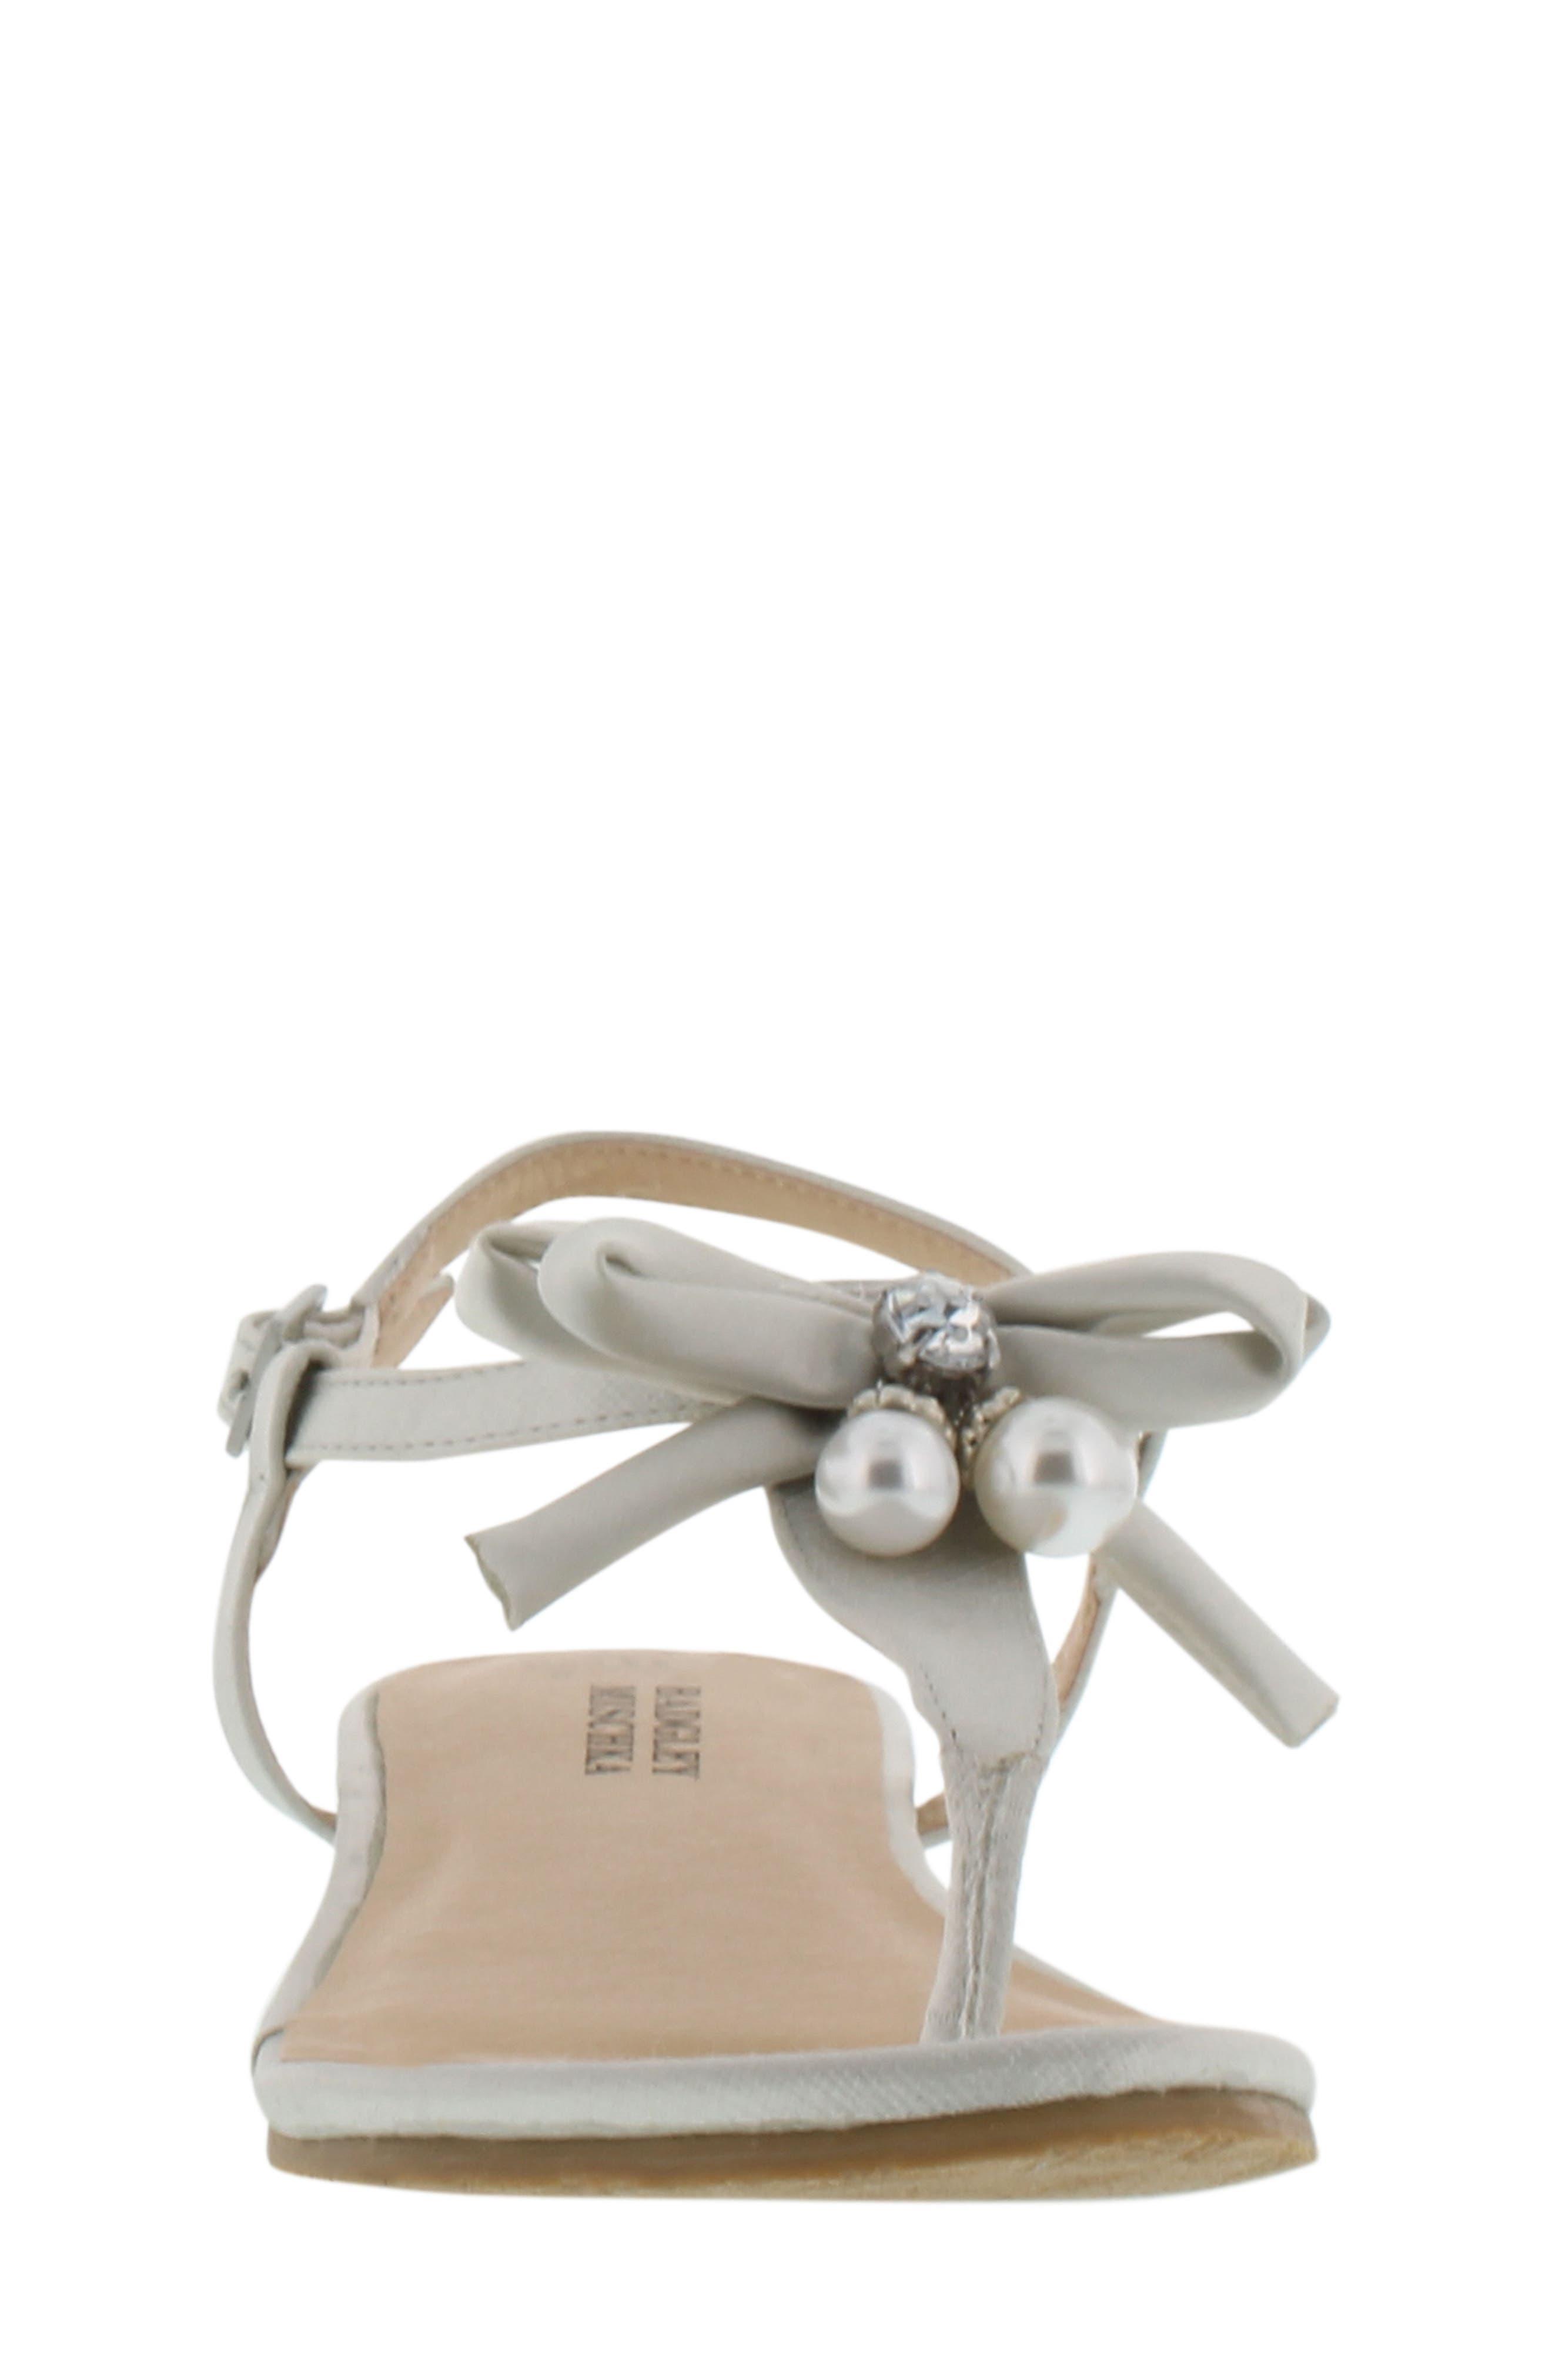 Talia Embellished Bow Sandal,                             Alternate thumbnail 4, color,                             Silver